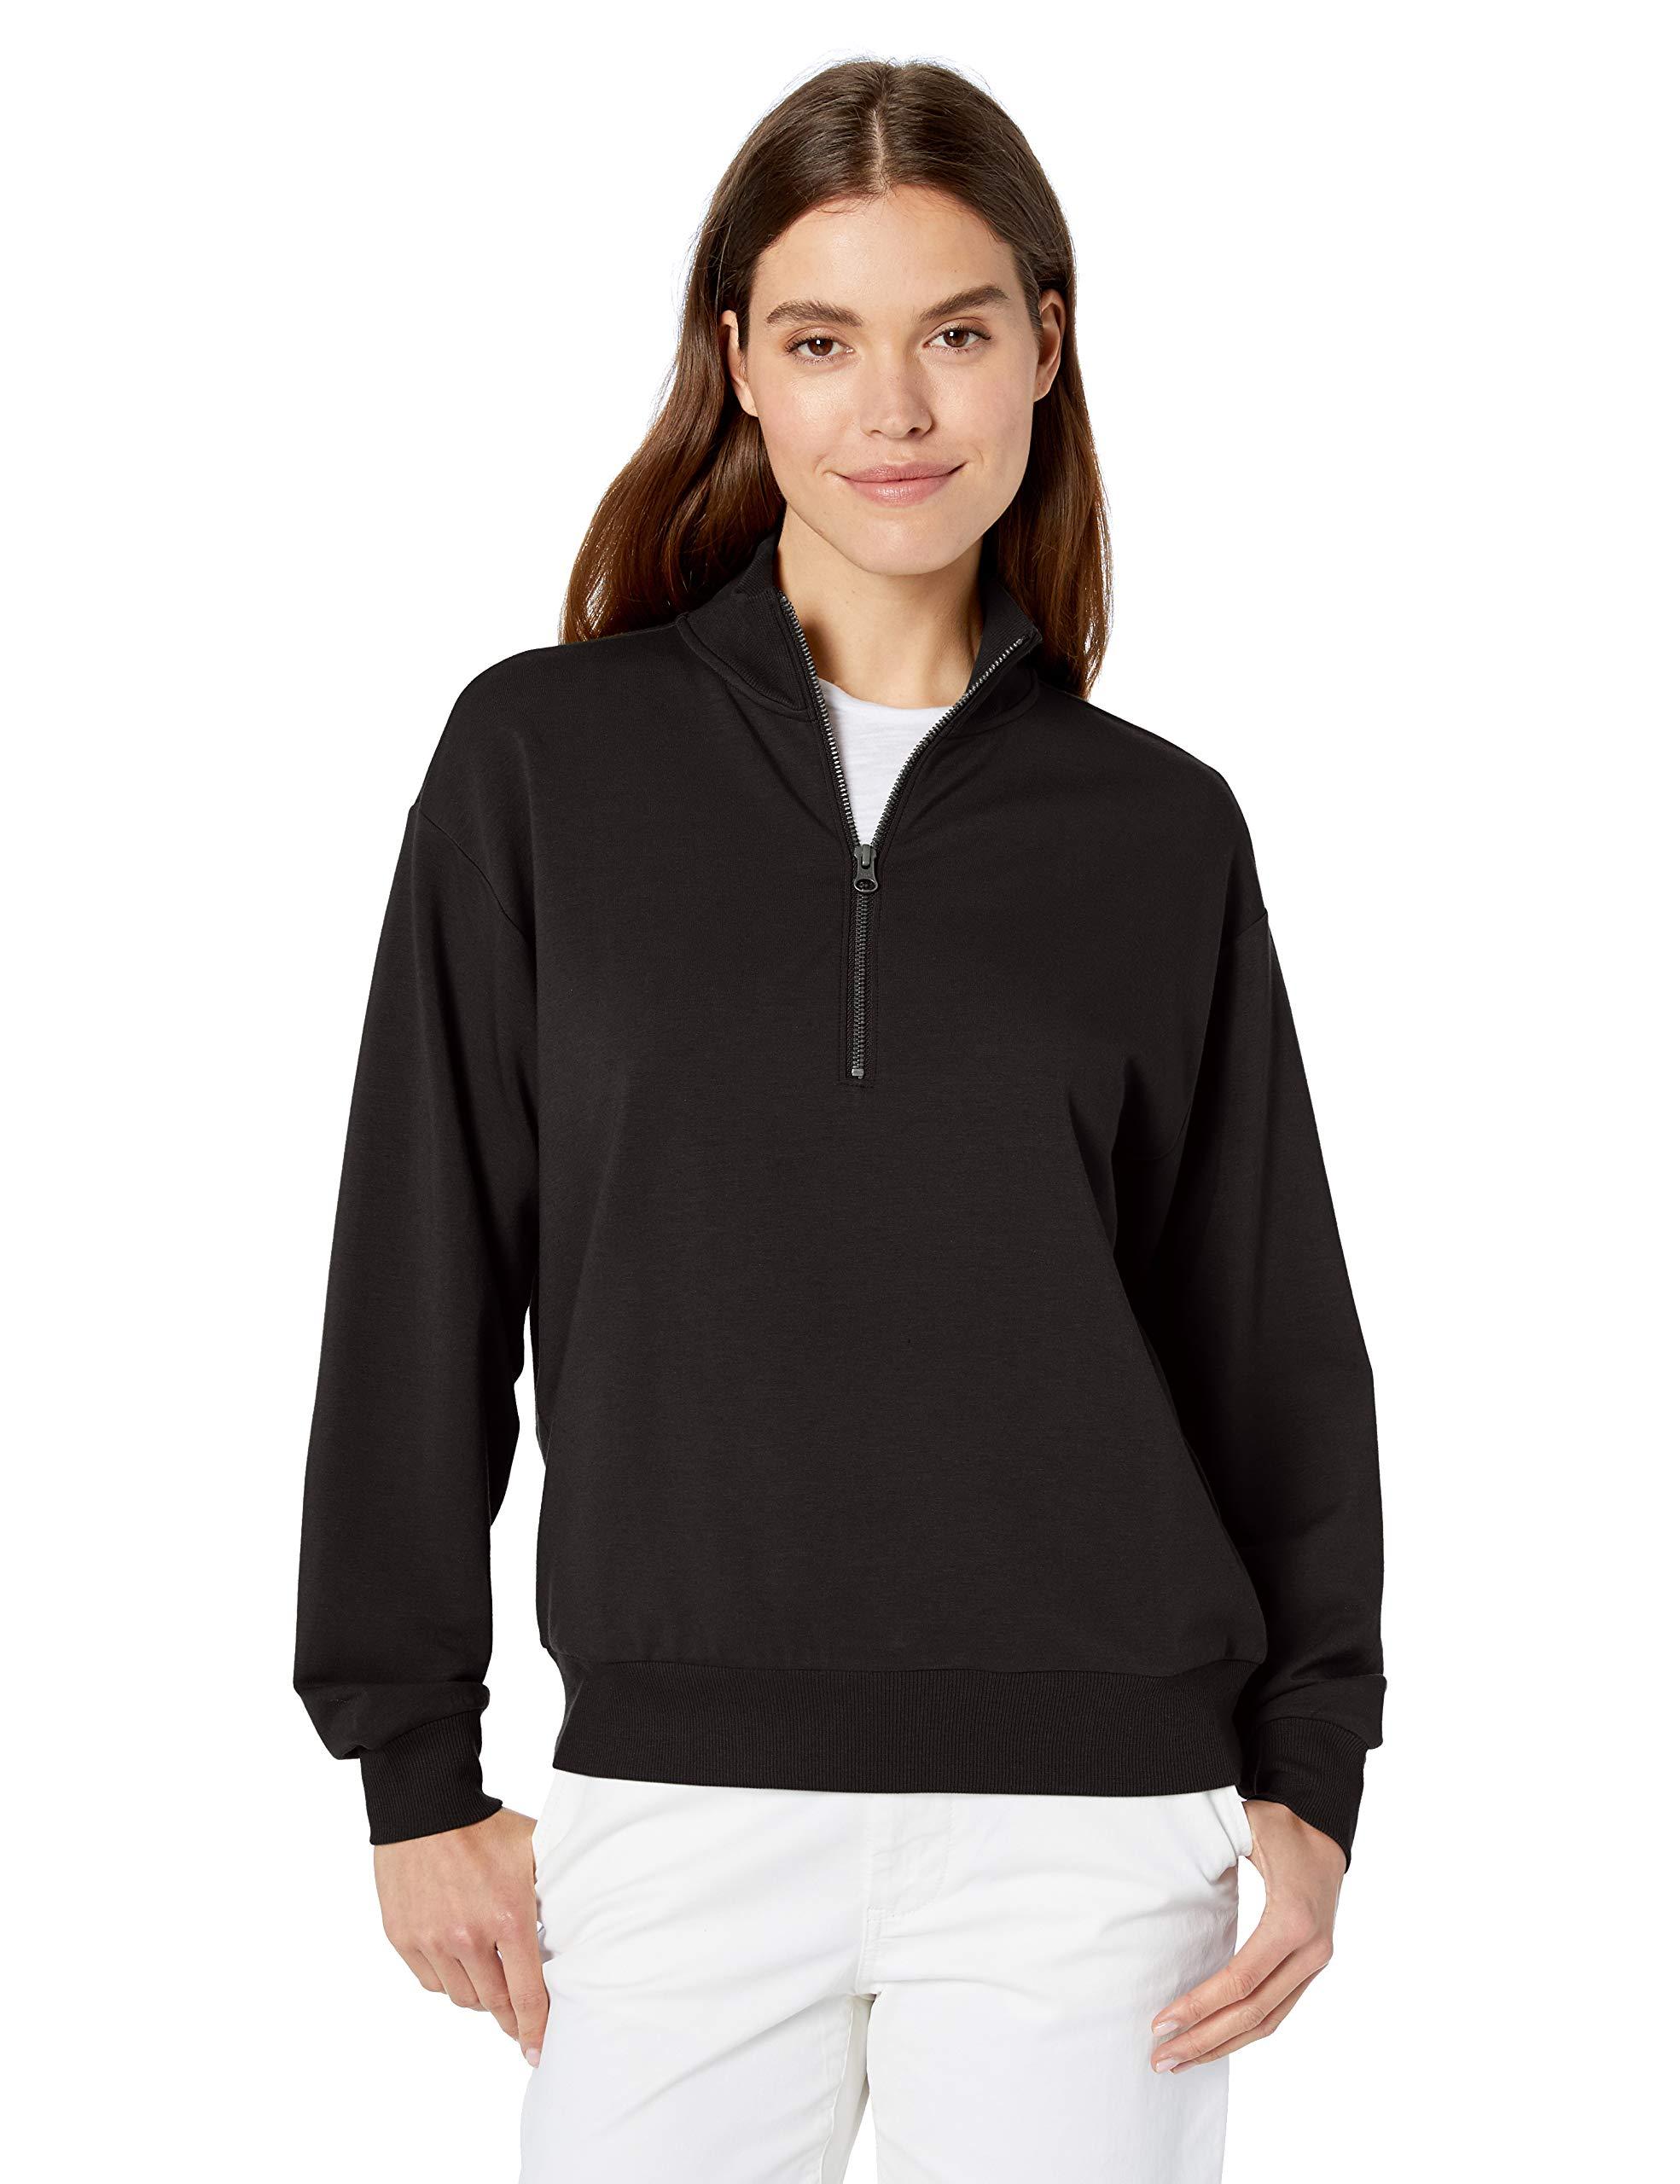 Amazon Brand - Terry Cotton & Modal Quarter-Zip Sweatshirt and Crop Jogger Set